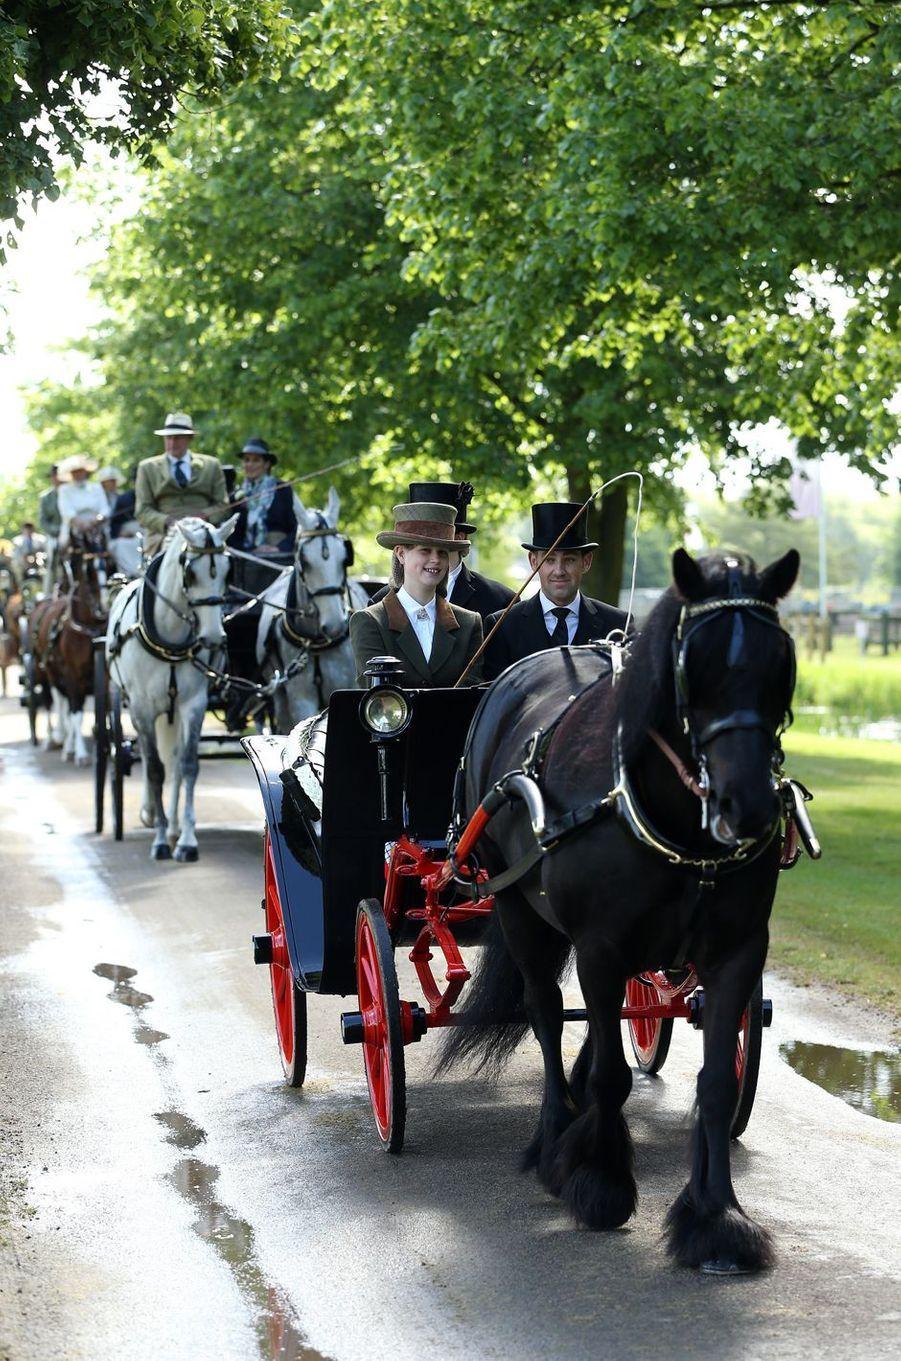 Lady Louise Windsor, petite-fille d'Elizabeth II, au Windsor Horse Show, le 14 mai 2017